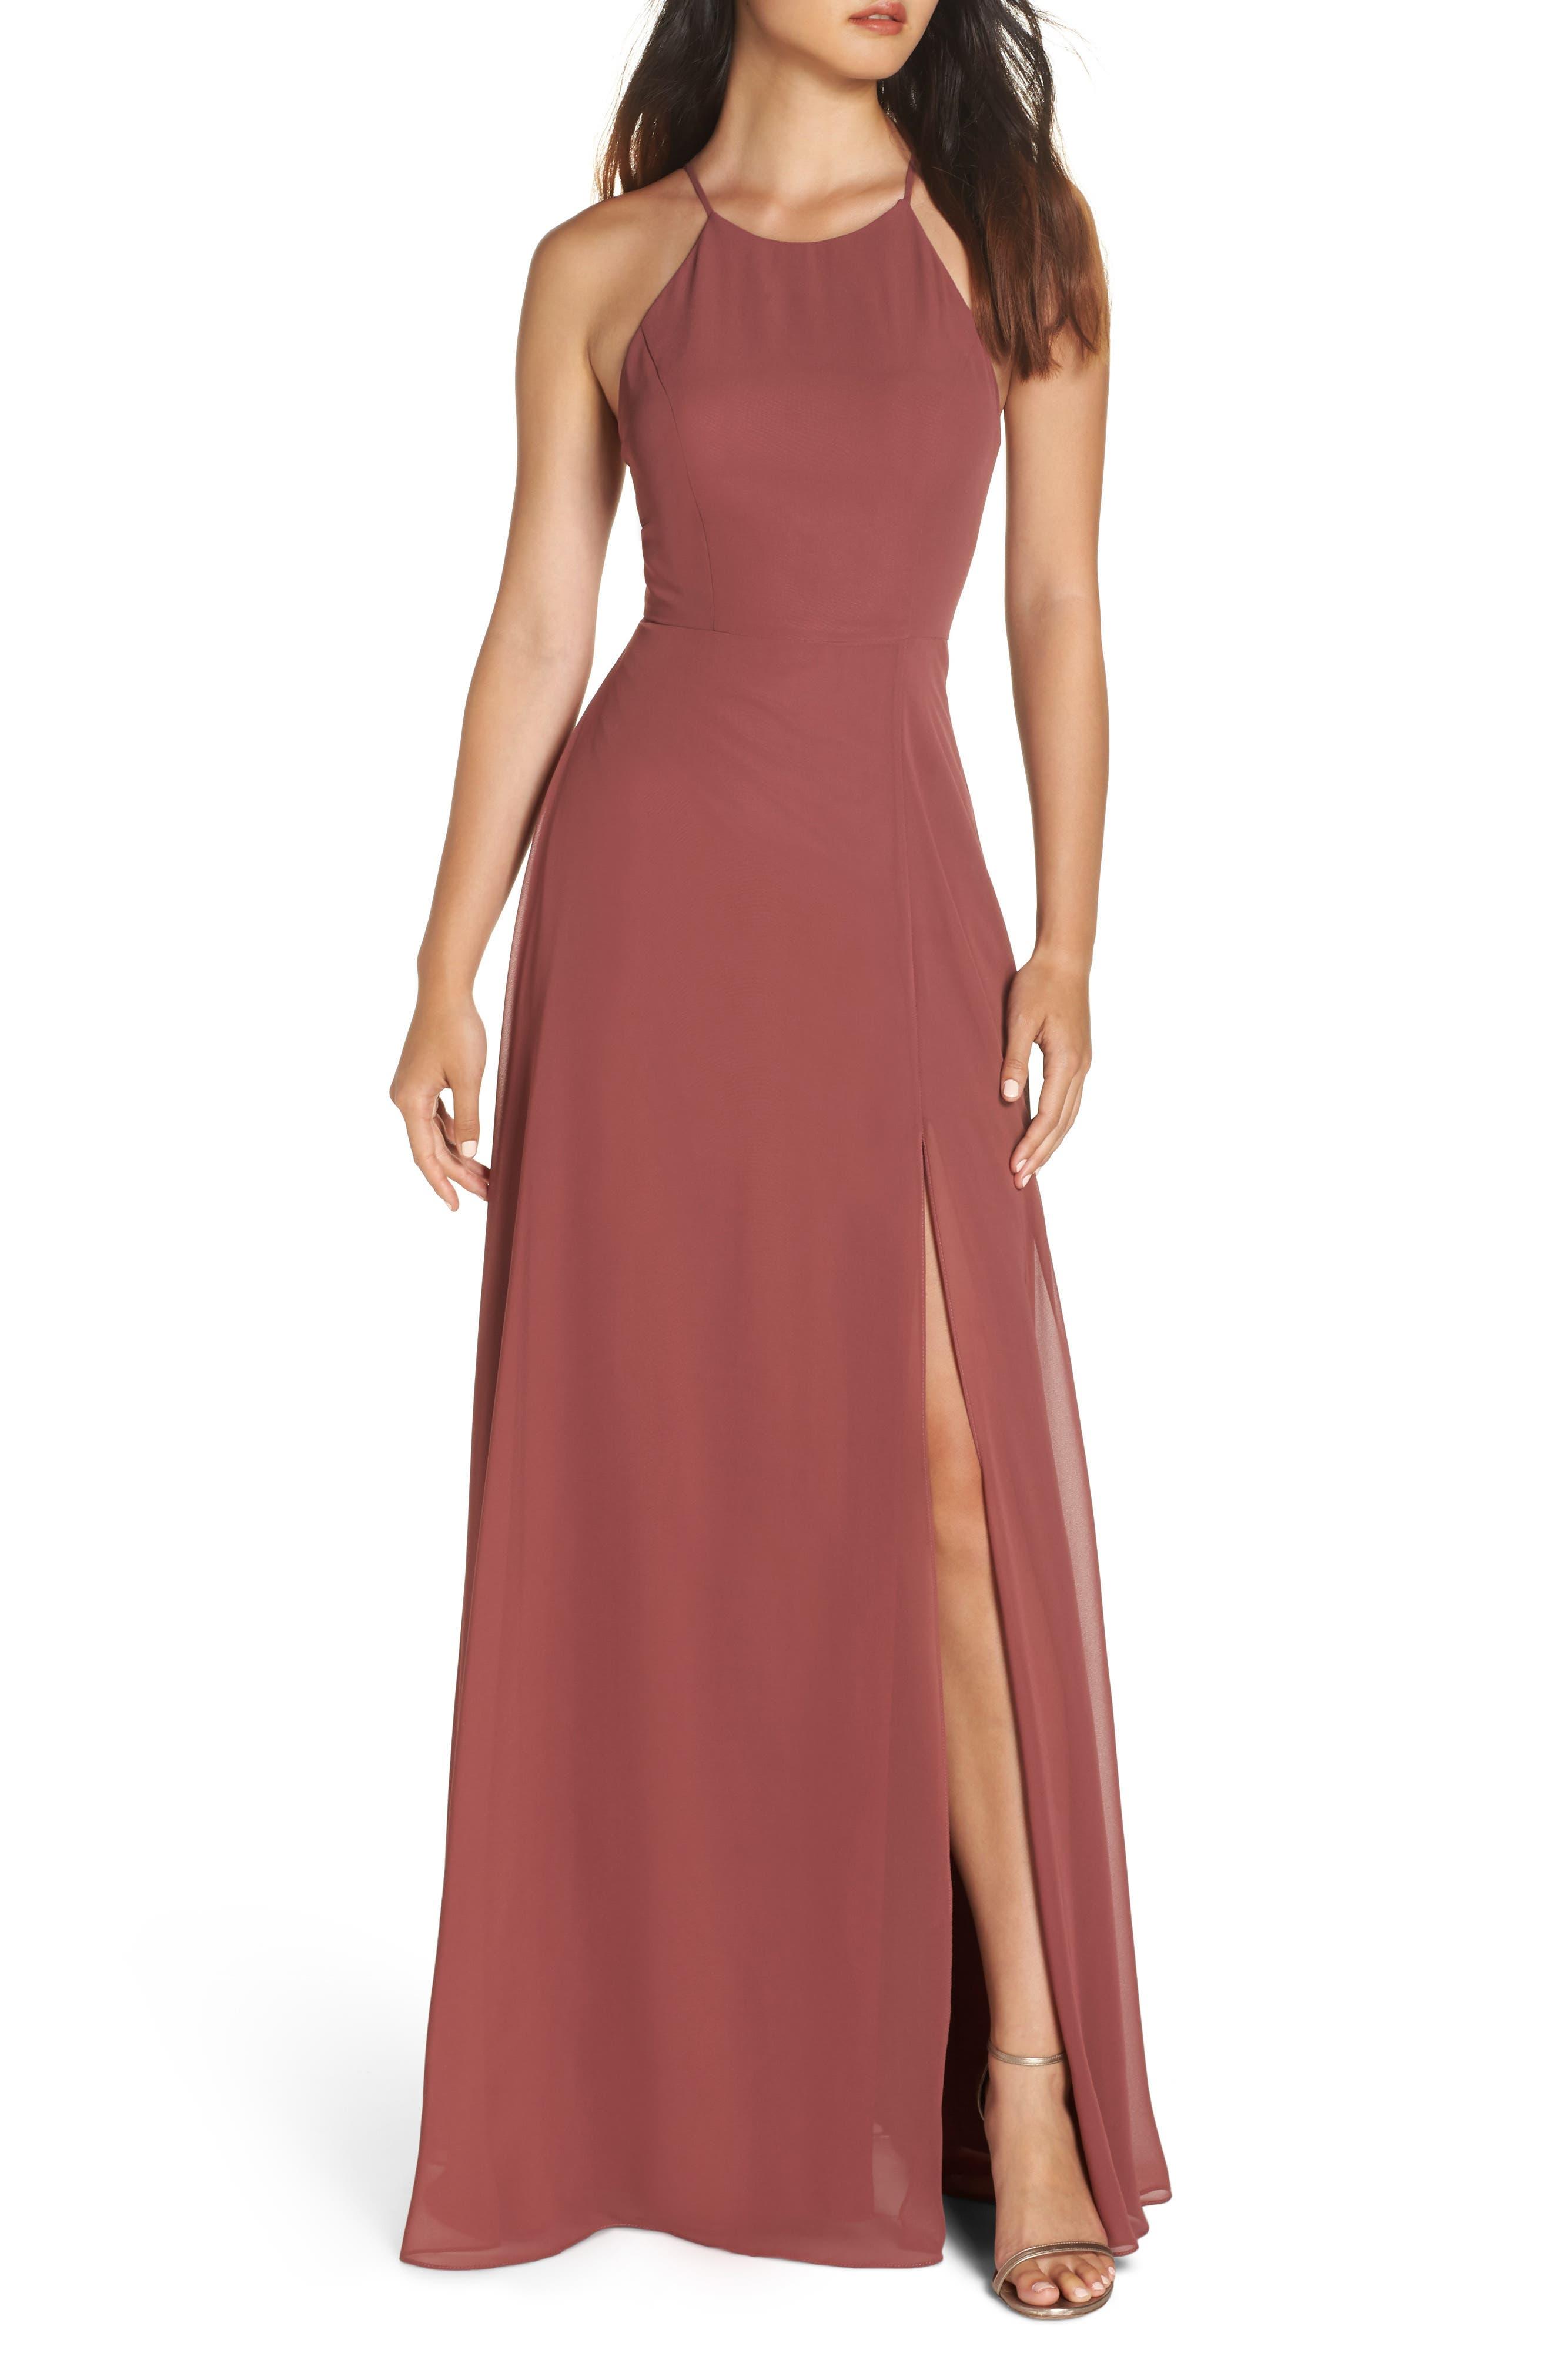 Kayla A-Line Halter Gown,                         Main,                         color, Cinnamon Rose